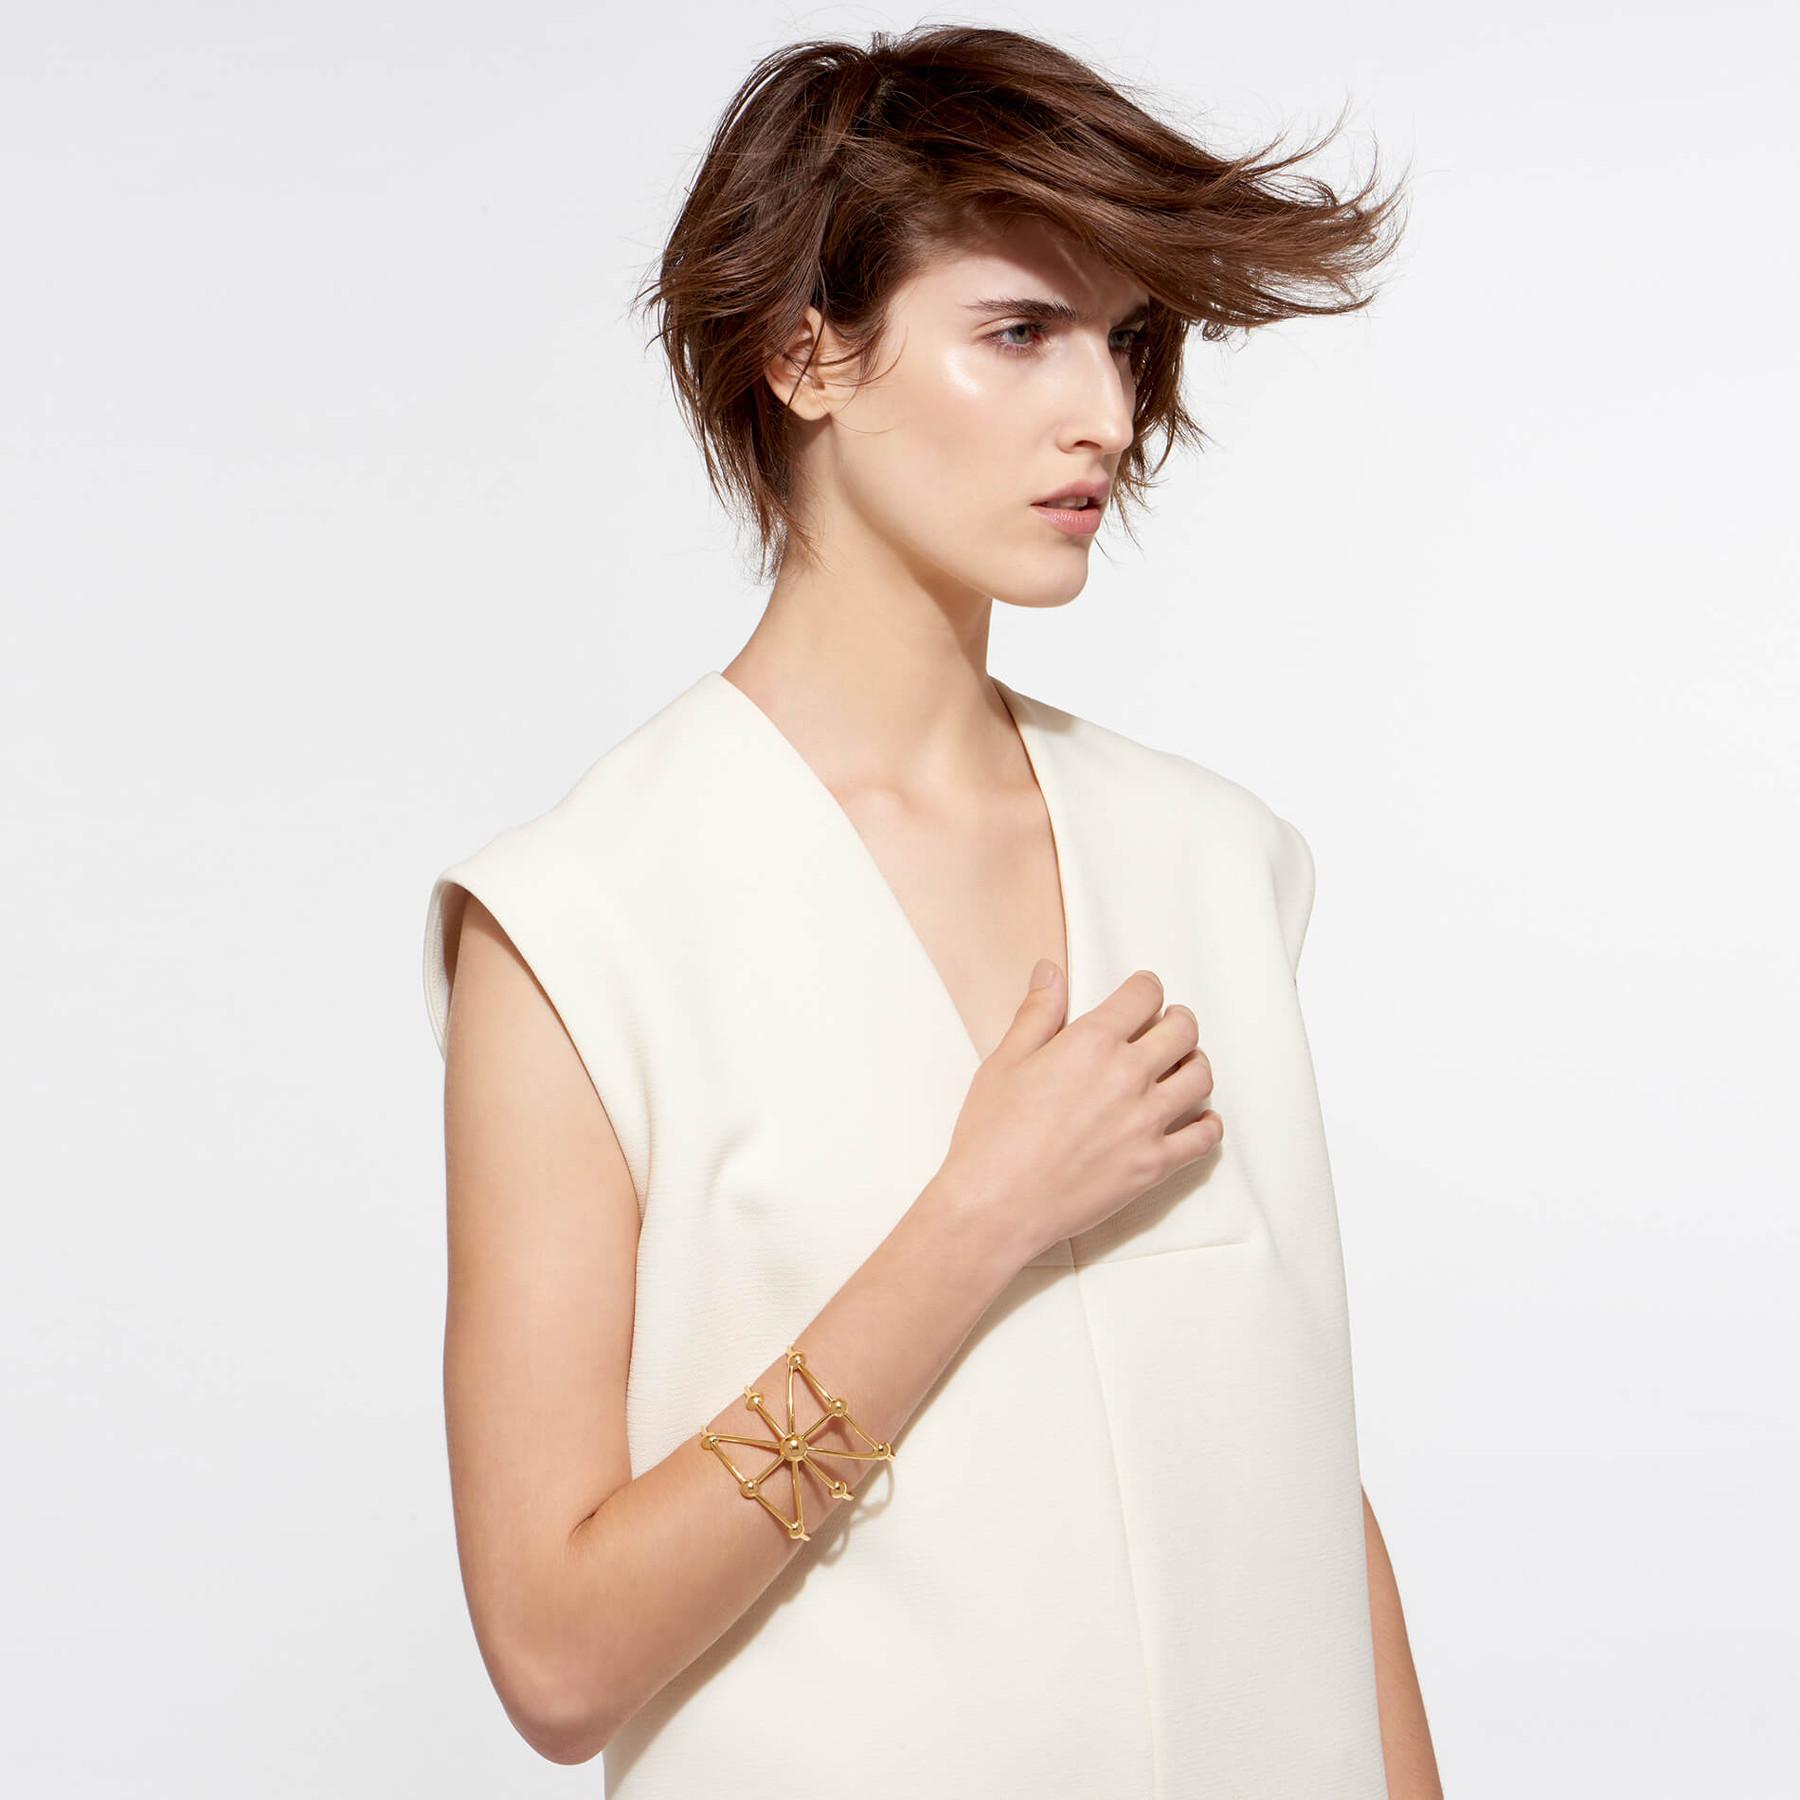 beautiful model wearing 22 karat gold wrist cuff in galactic design